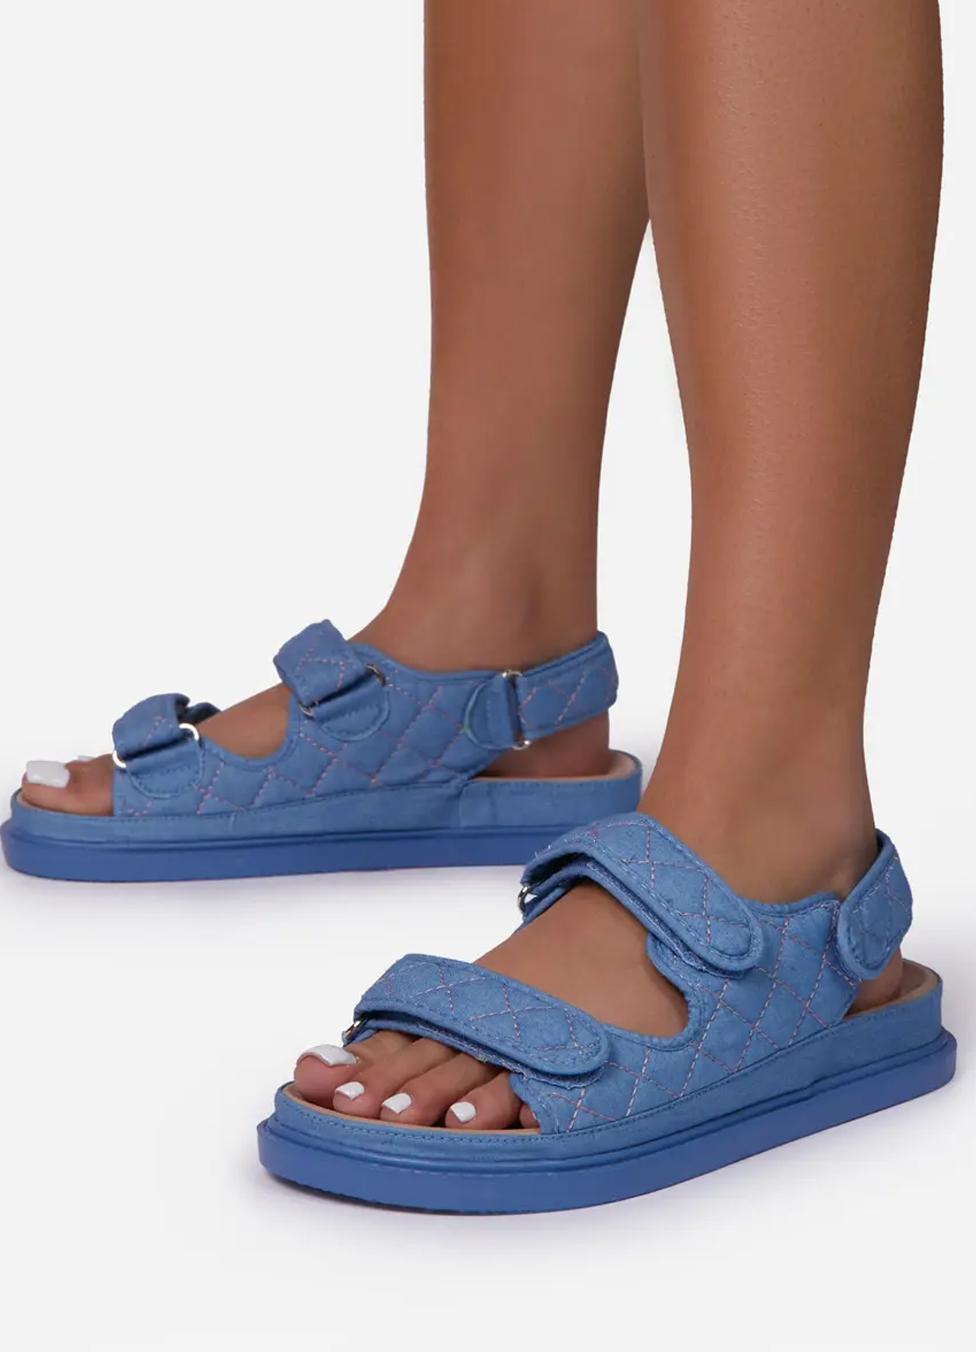 chanel dad sandals denim dupe